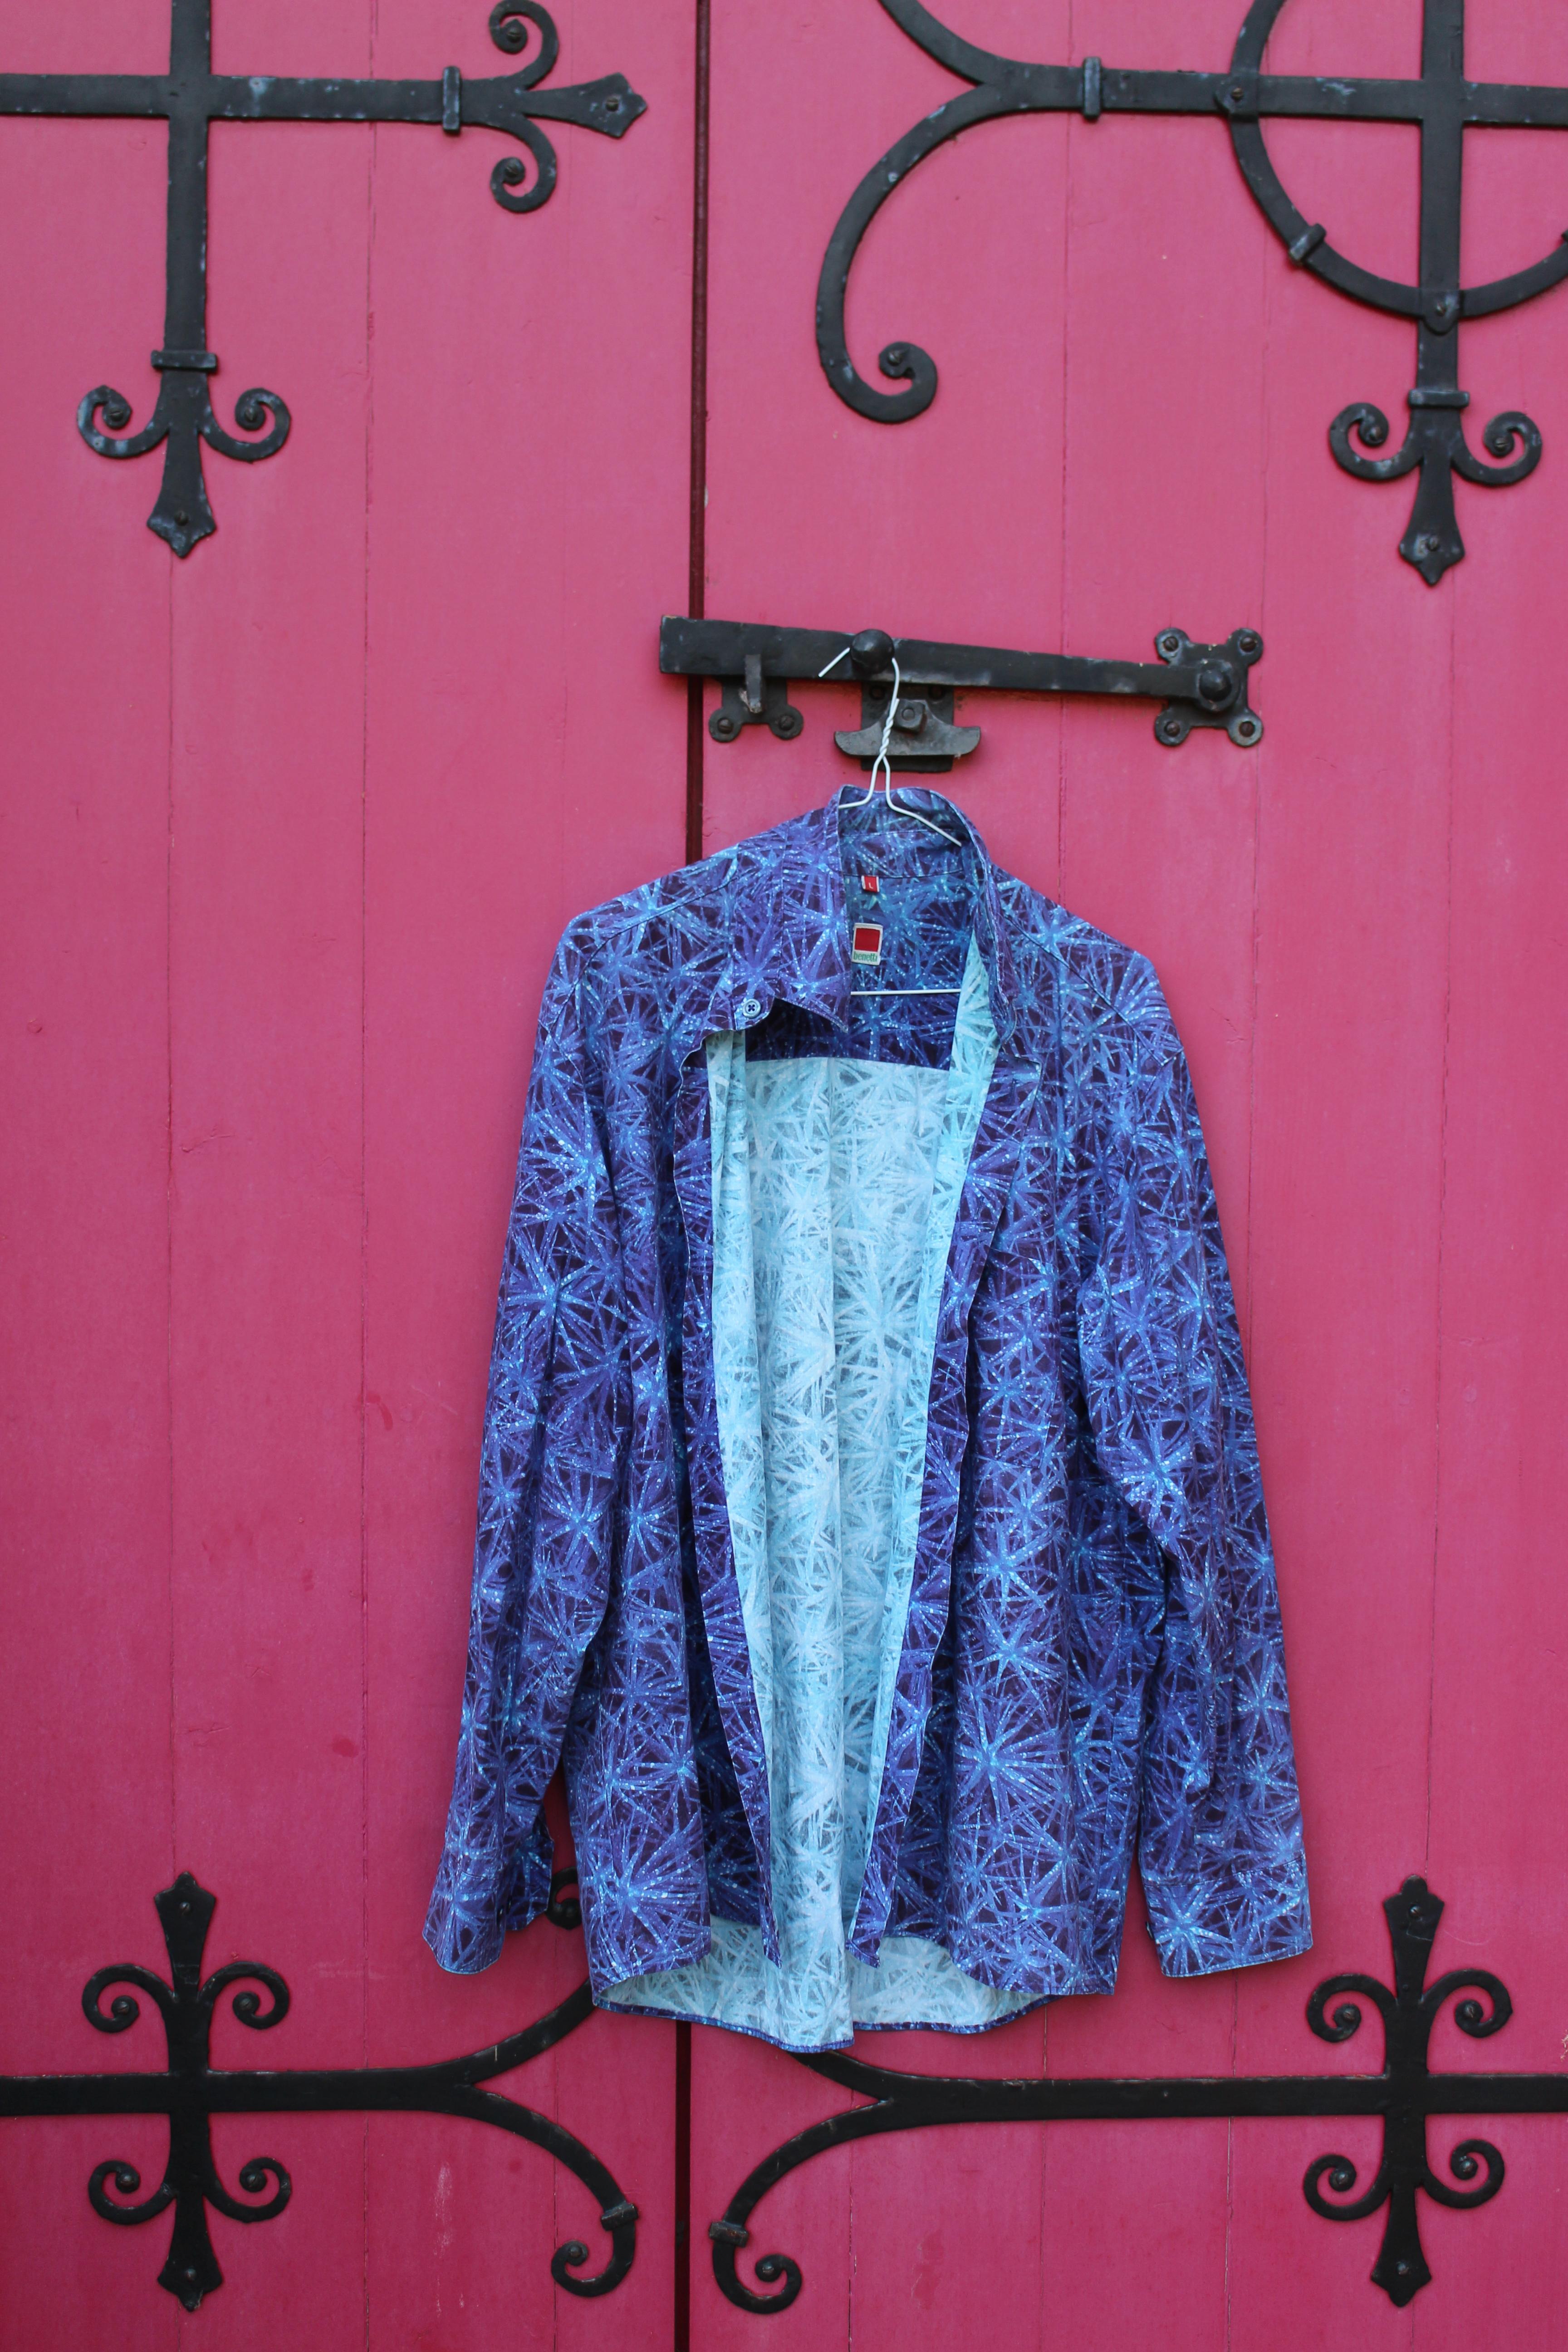 Benetti purple blue blend shirt, bought somewhere in Aachen